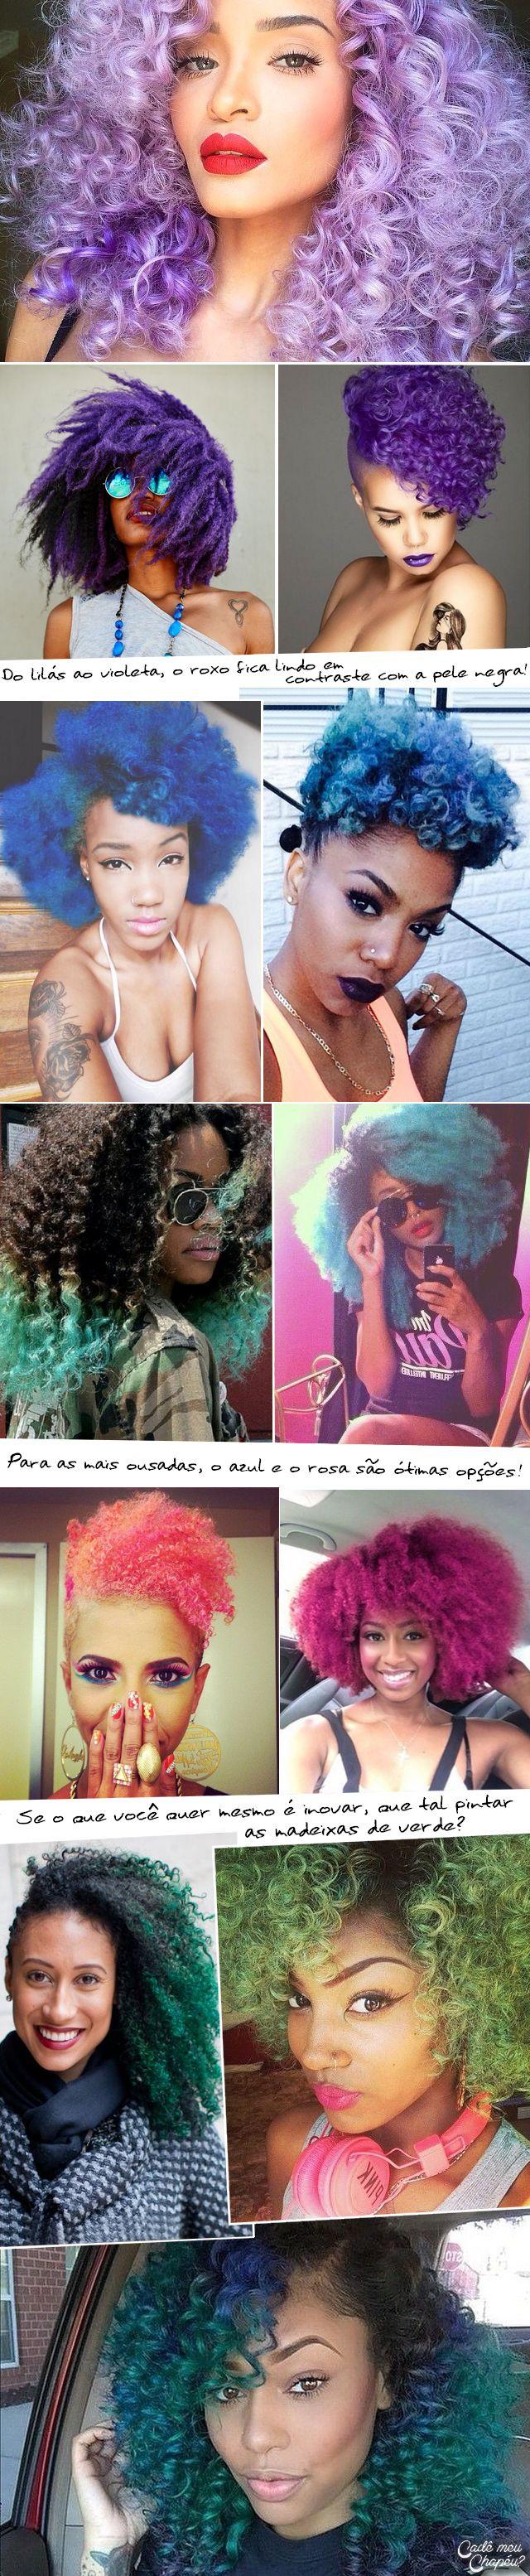 Natural Hair | Afro Hair | Curly Hair | Cabelo Crespo | Cabelo Cacheado | Cadê meu Chapéu? | http://www.cademeuchapeu.com